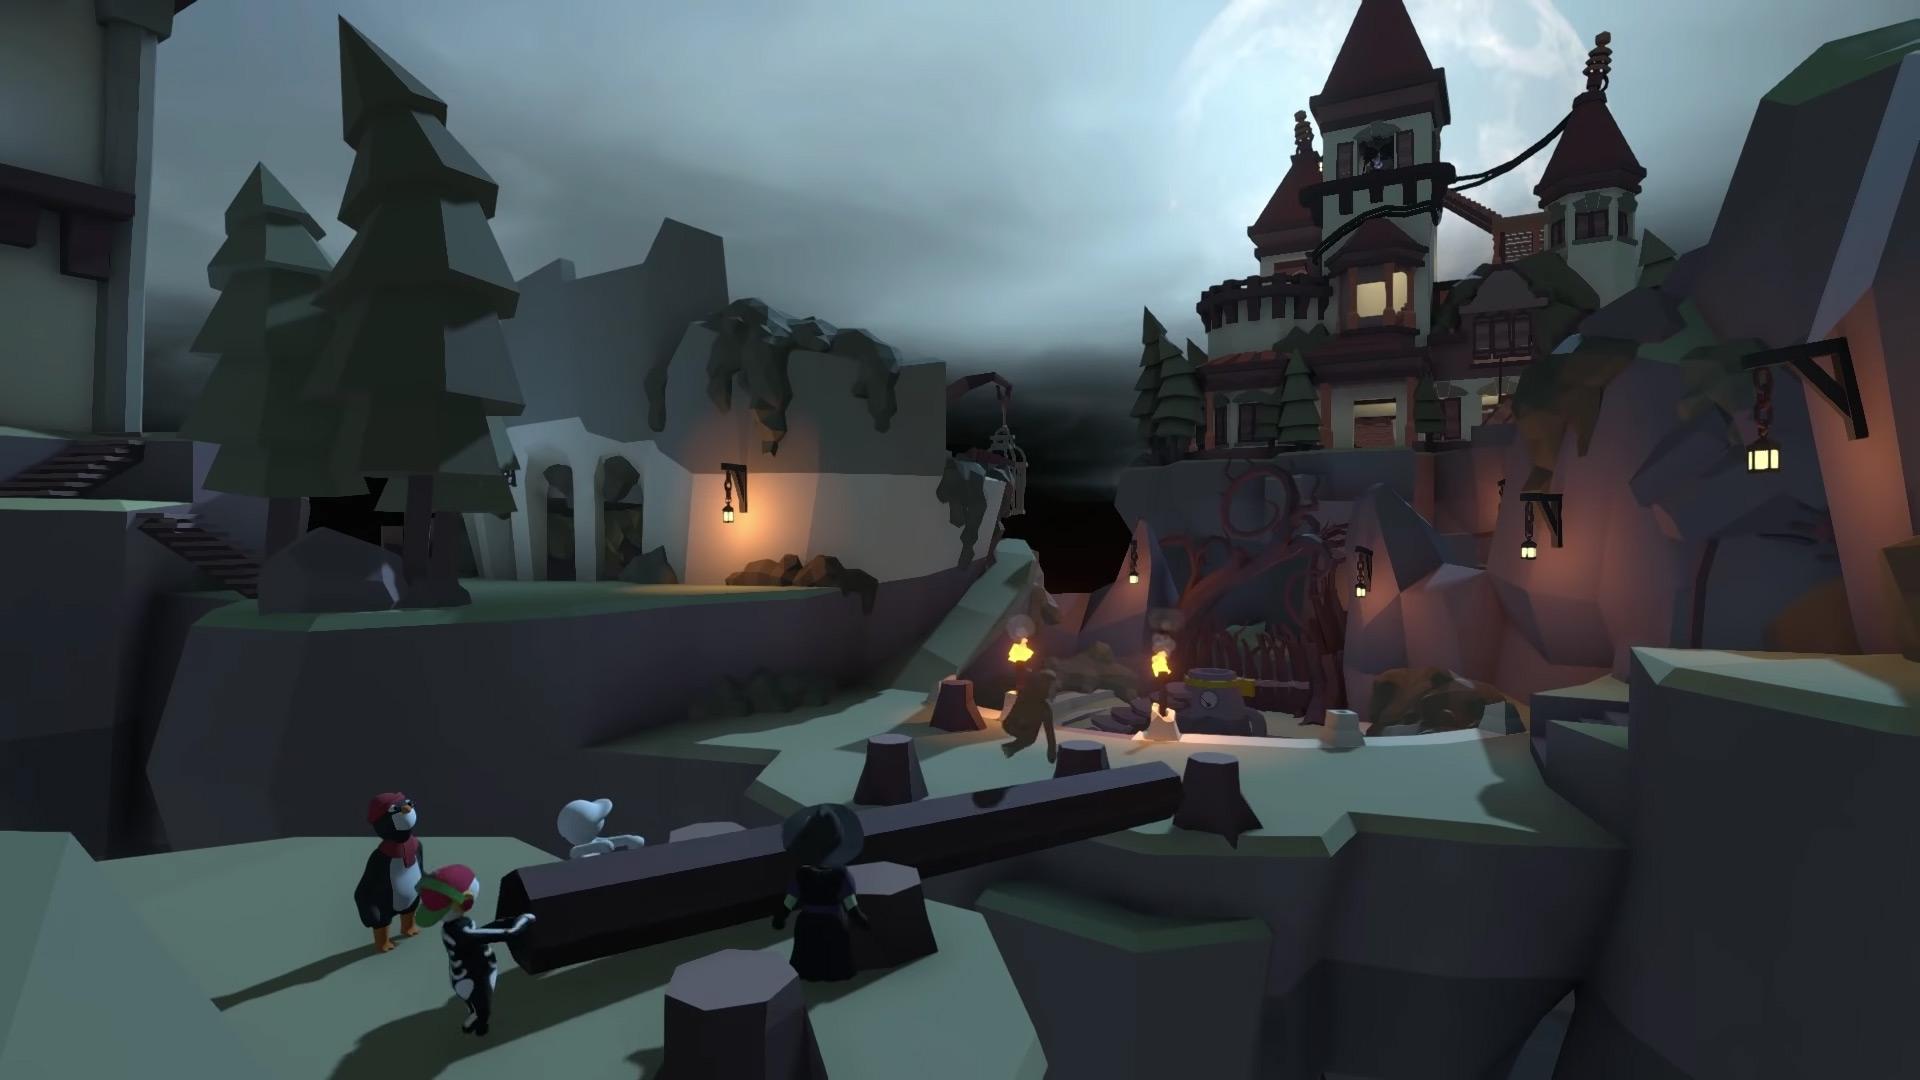 Silly physics platformer Human: Fall Flat has a new level screenshot